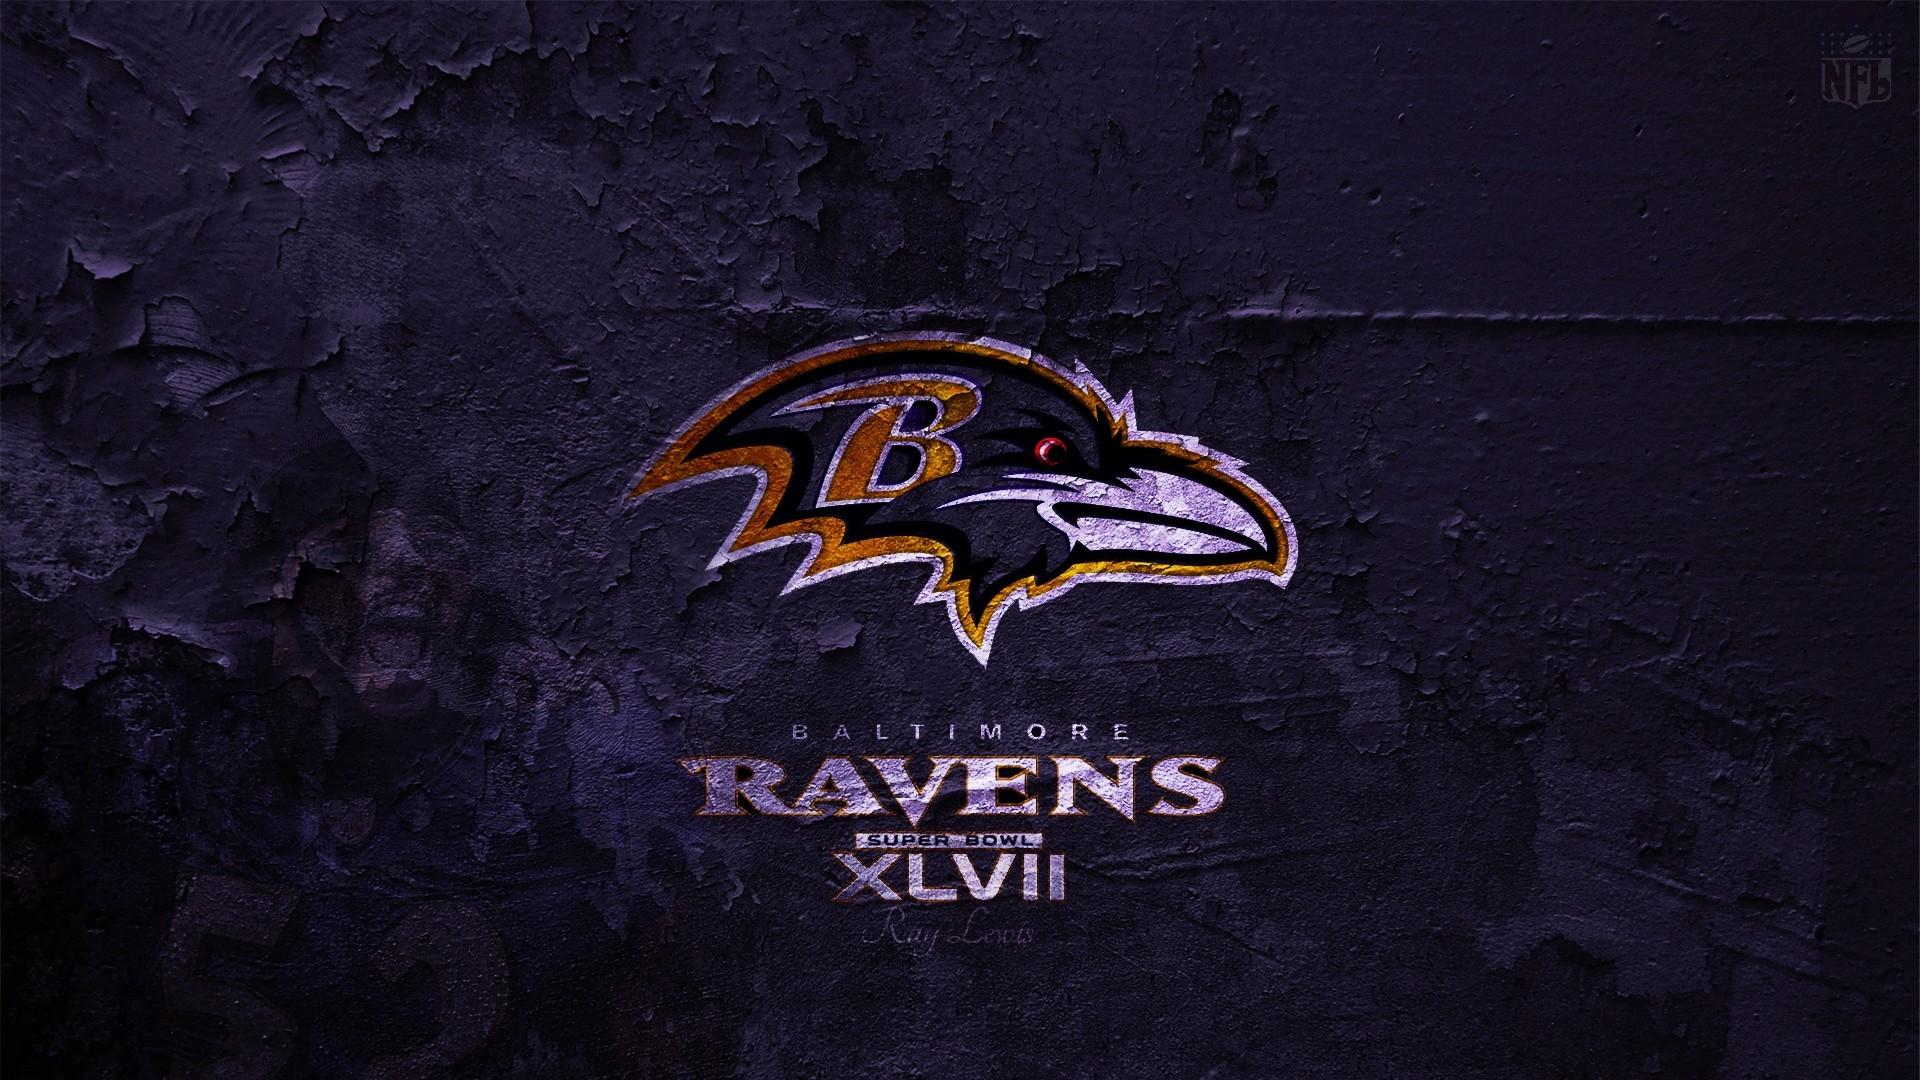 Baltimore Ravens computer wallpaper